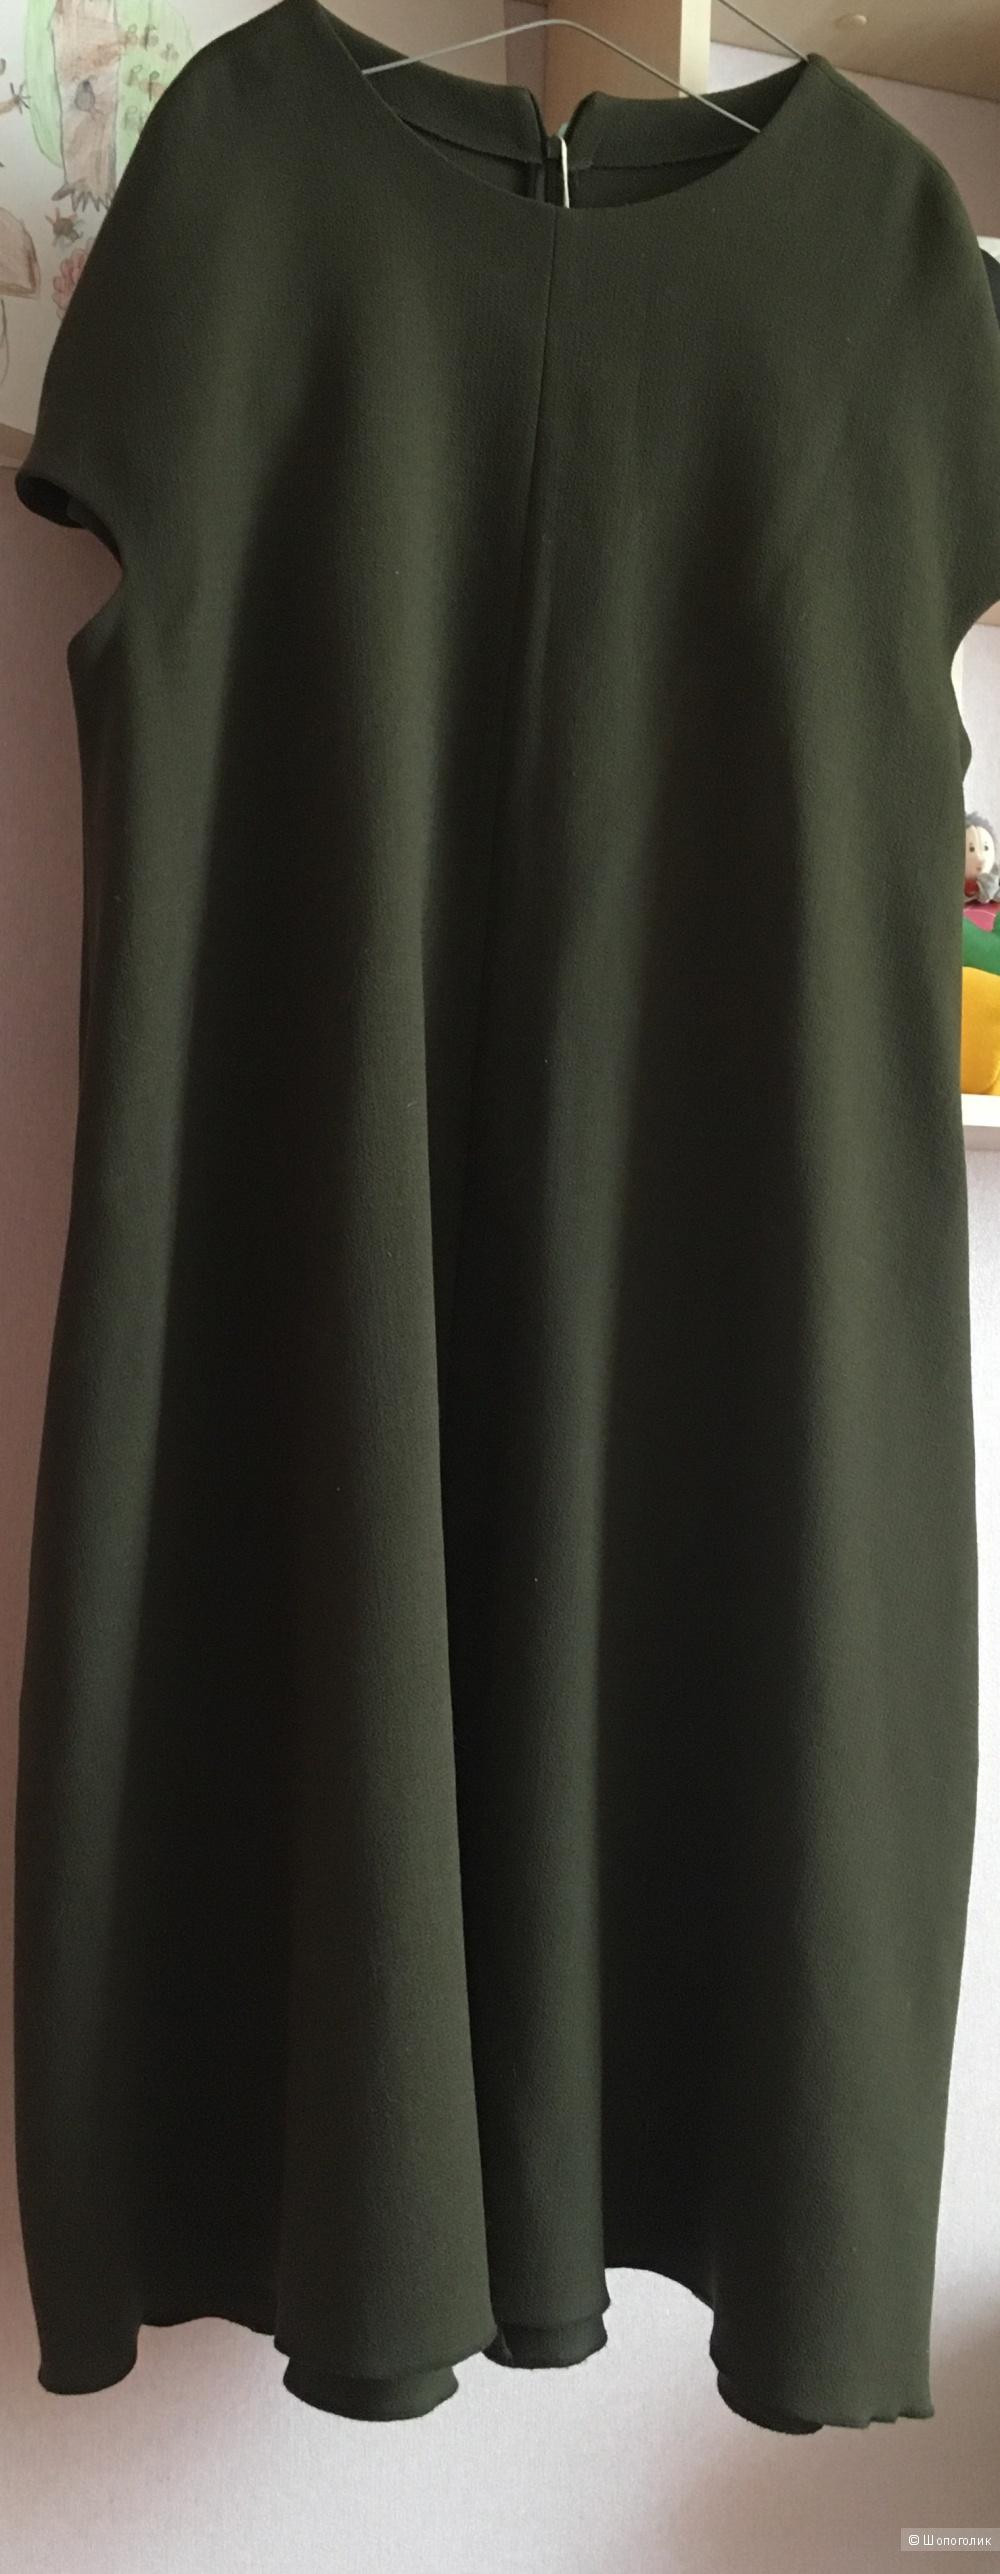 Платье Ter Et Bantine, 44 ит.размер,  оверсайз